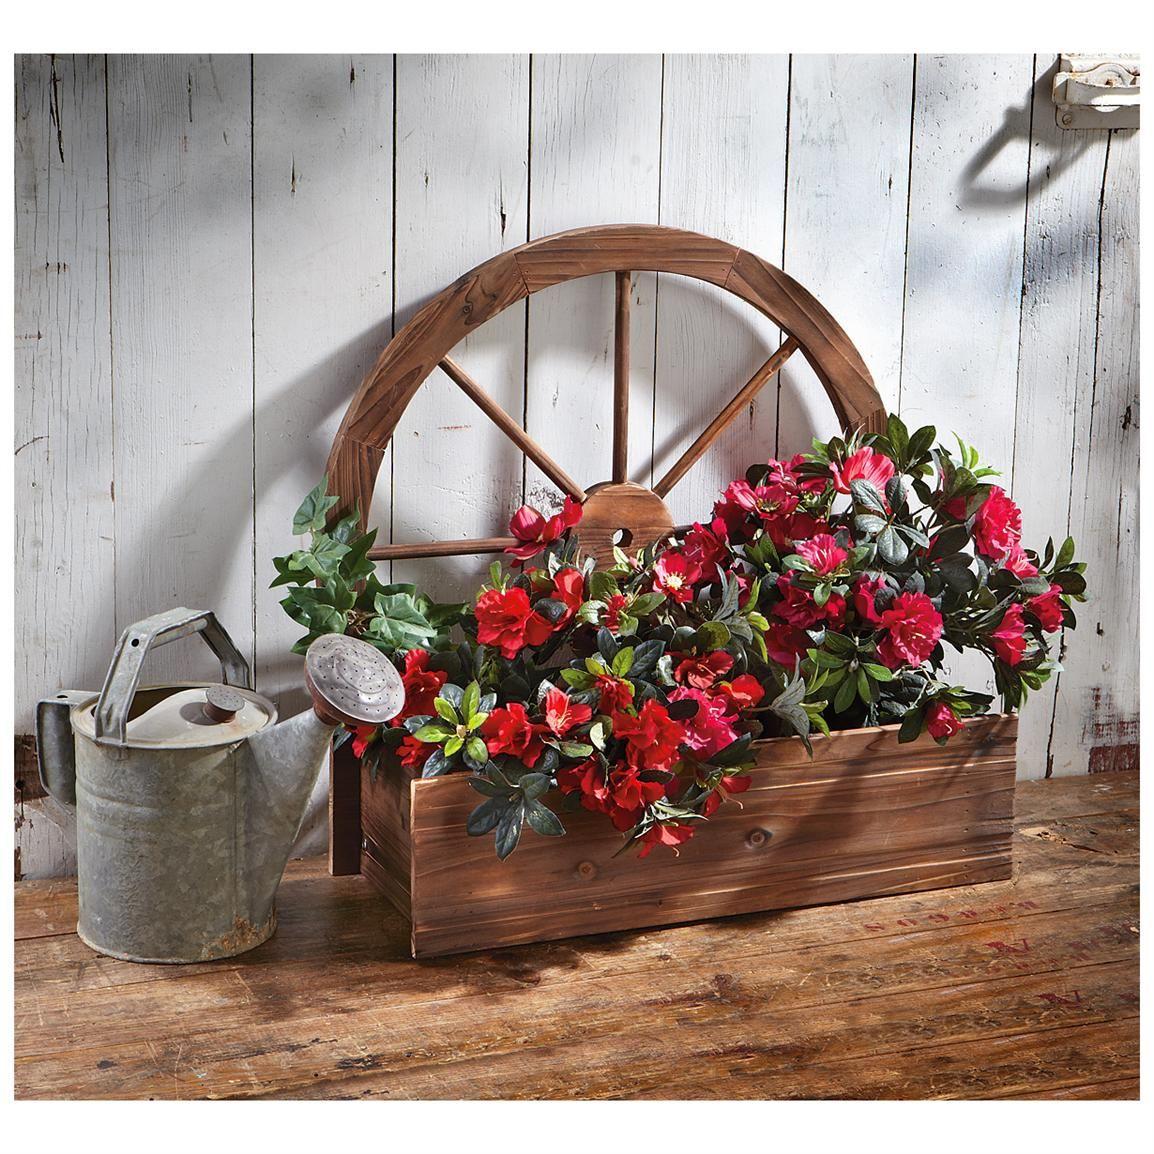 castlecreek wagon wheel planter vintage design ideas pinterest wagon wheels planters and. Black Bedroom Furniture Sets. Home Design Ideas